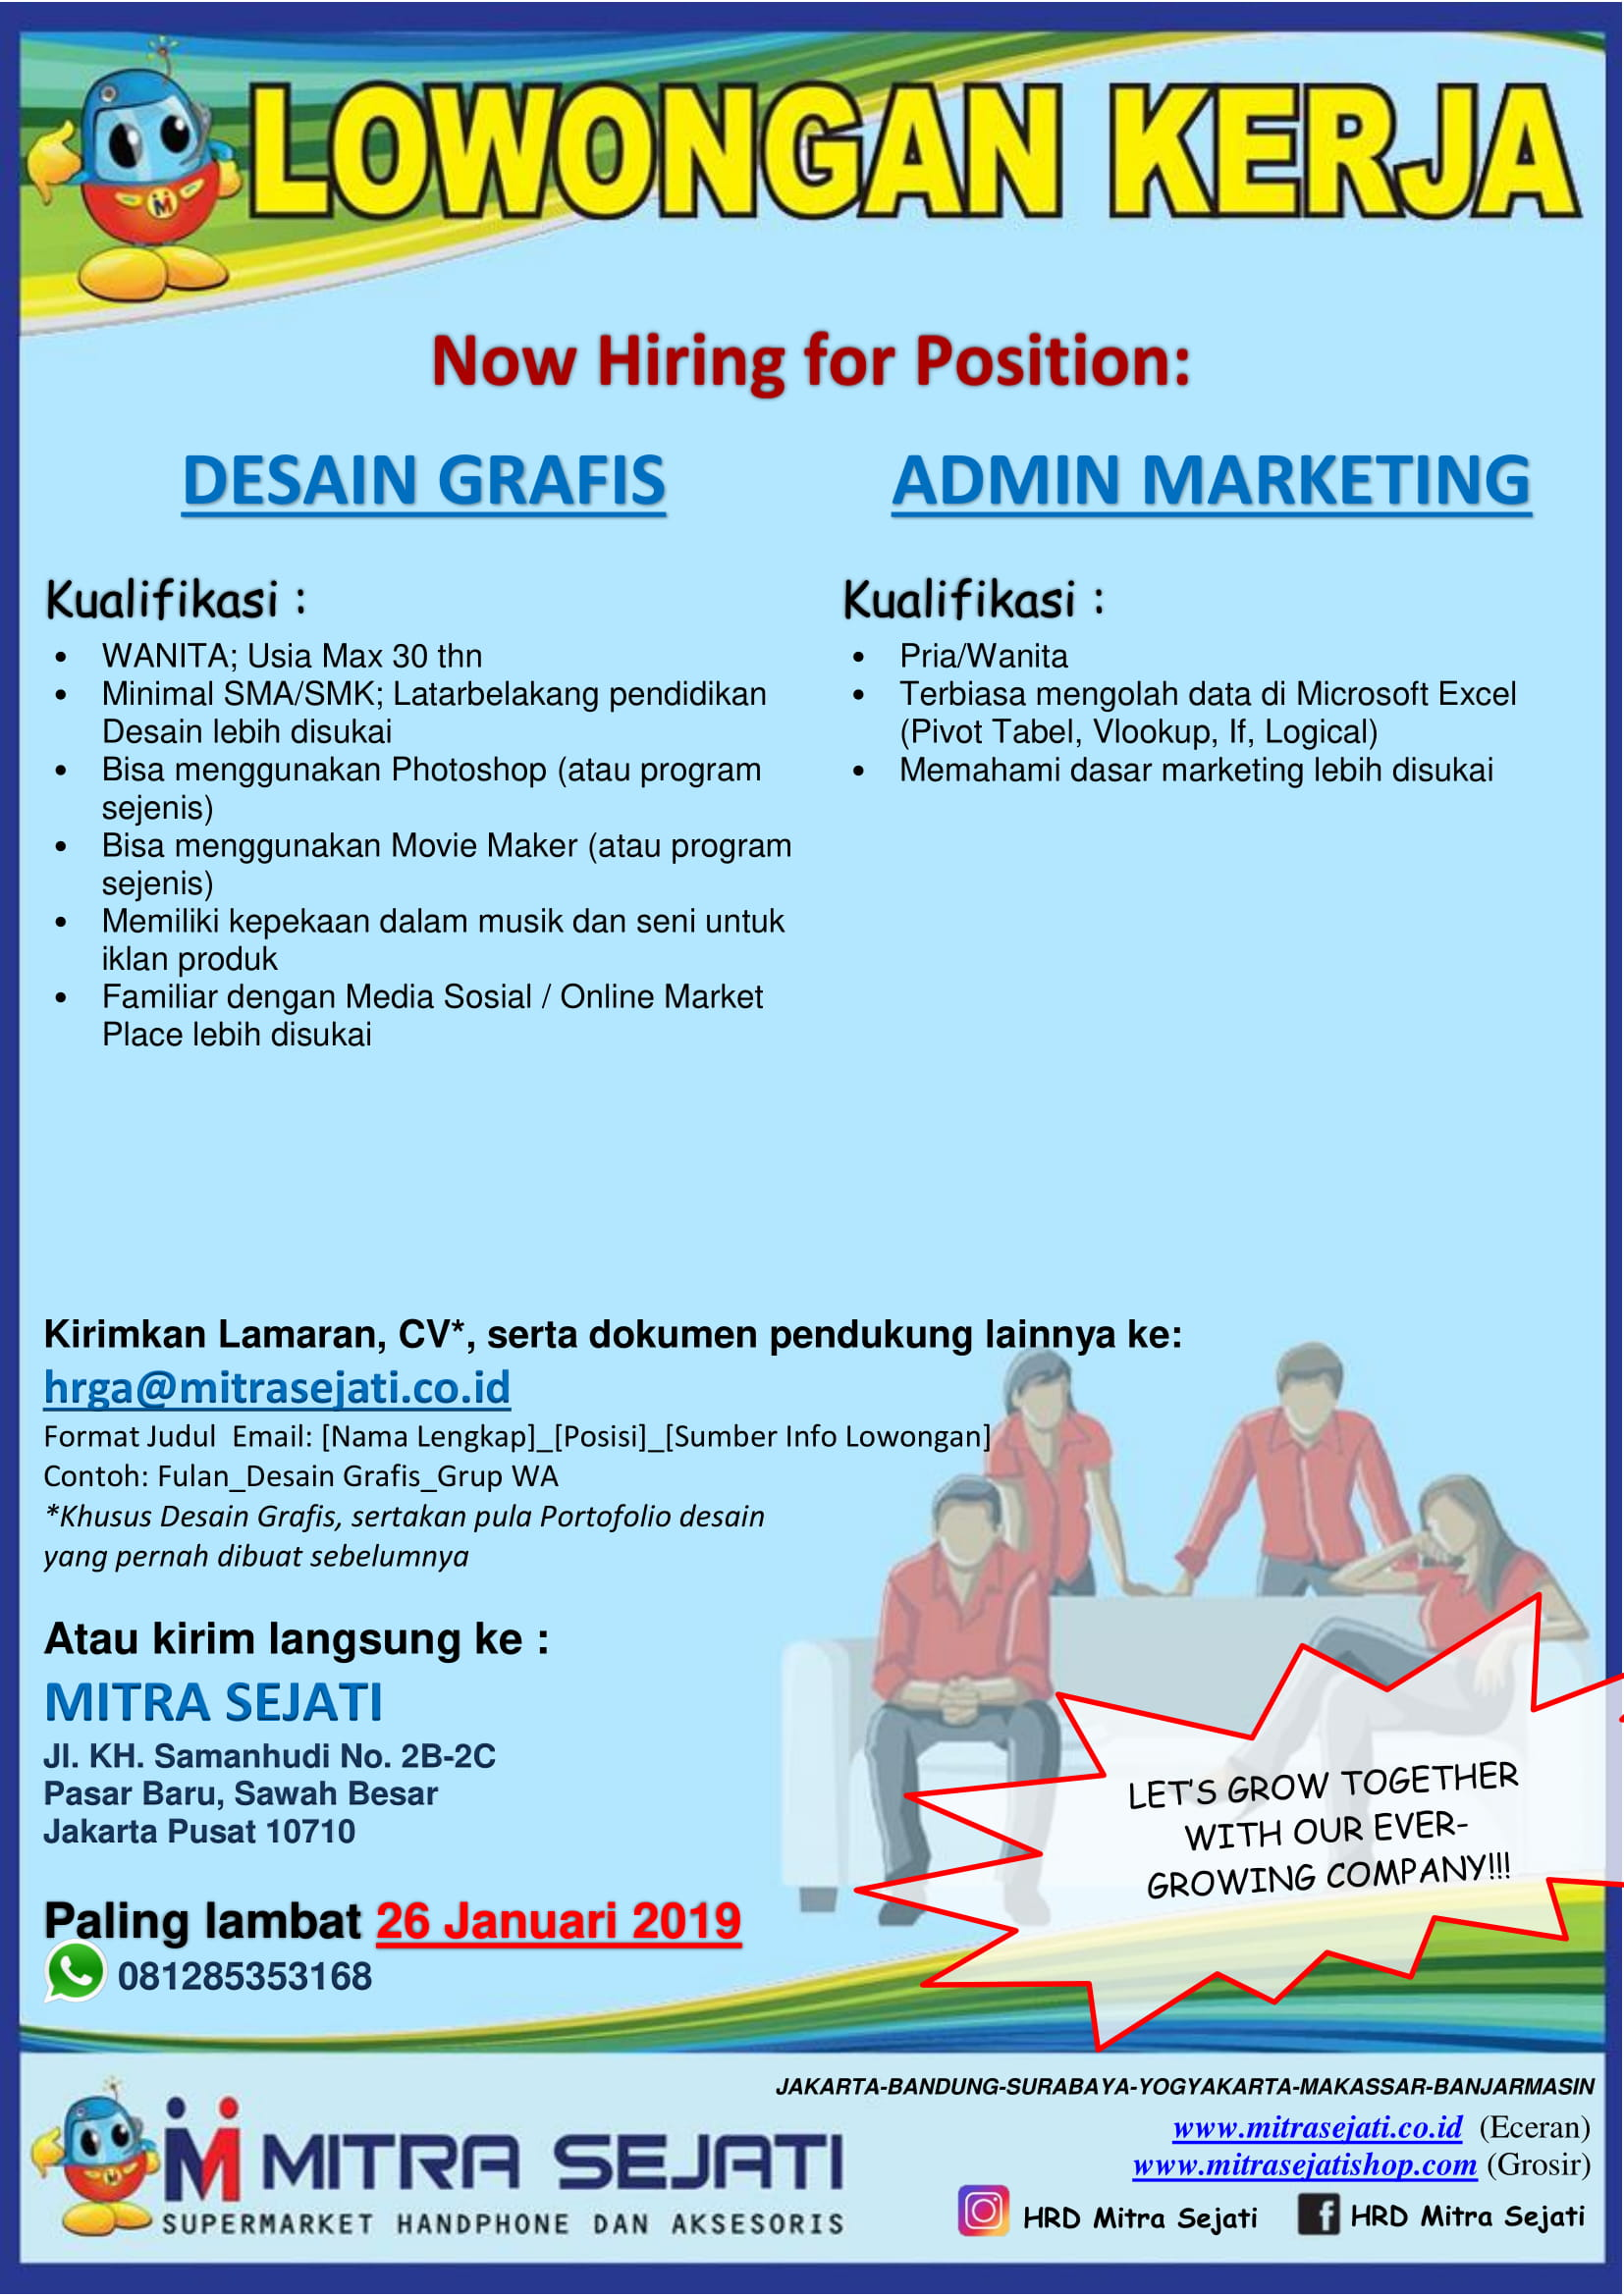 Admin Marketing At Cv Mitra Sejati